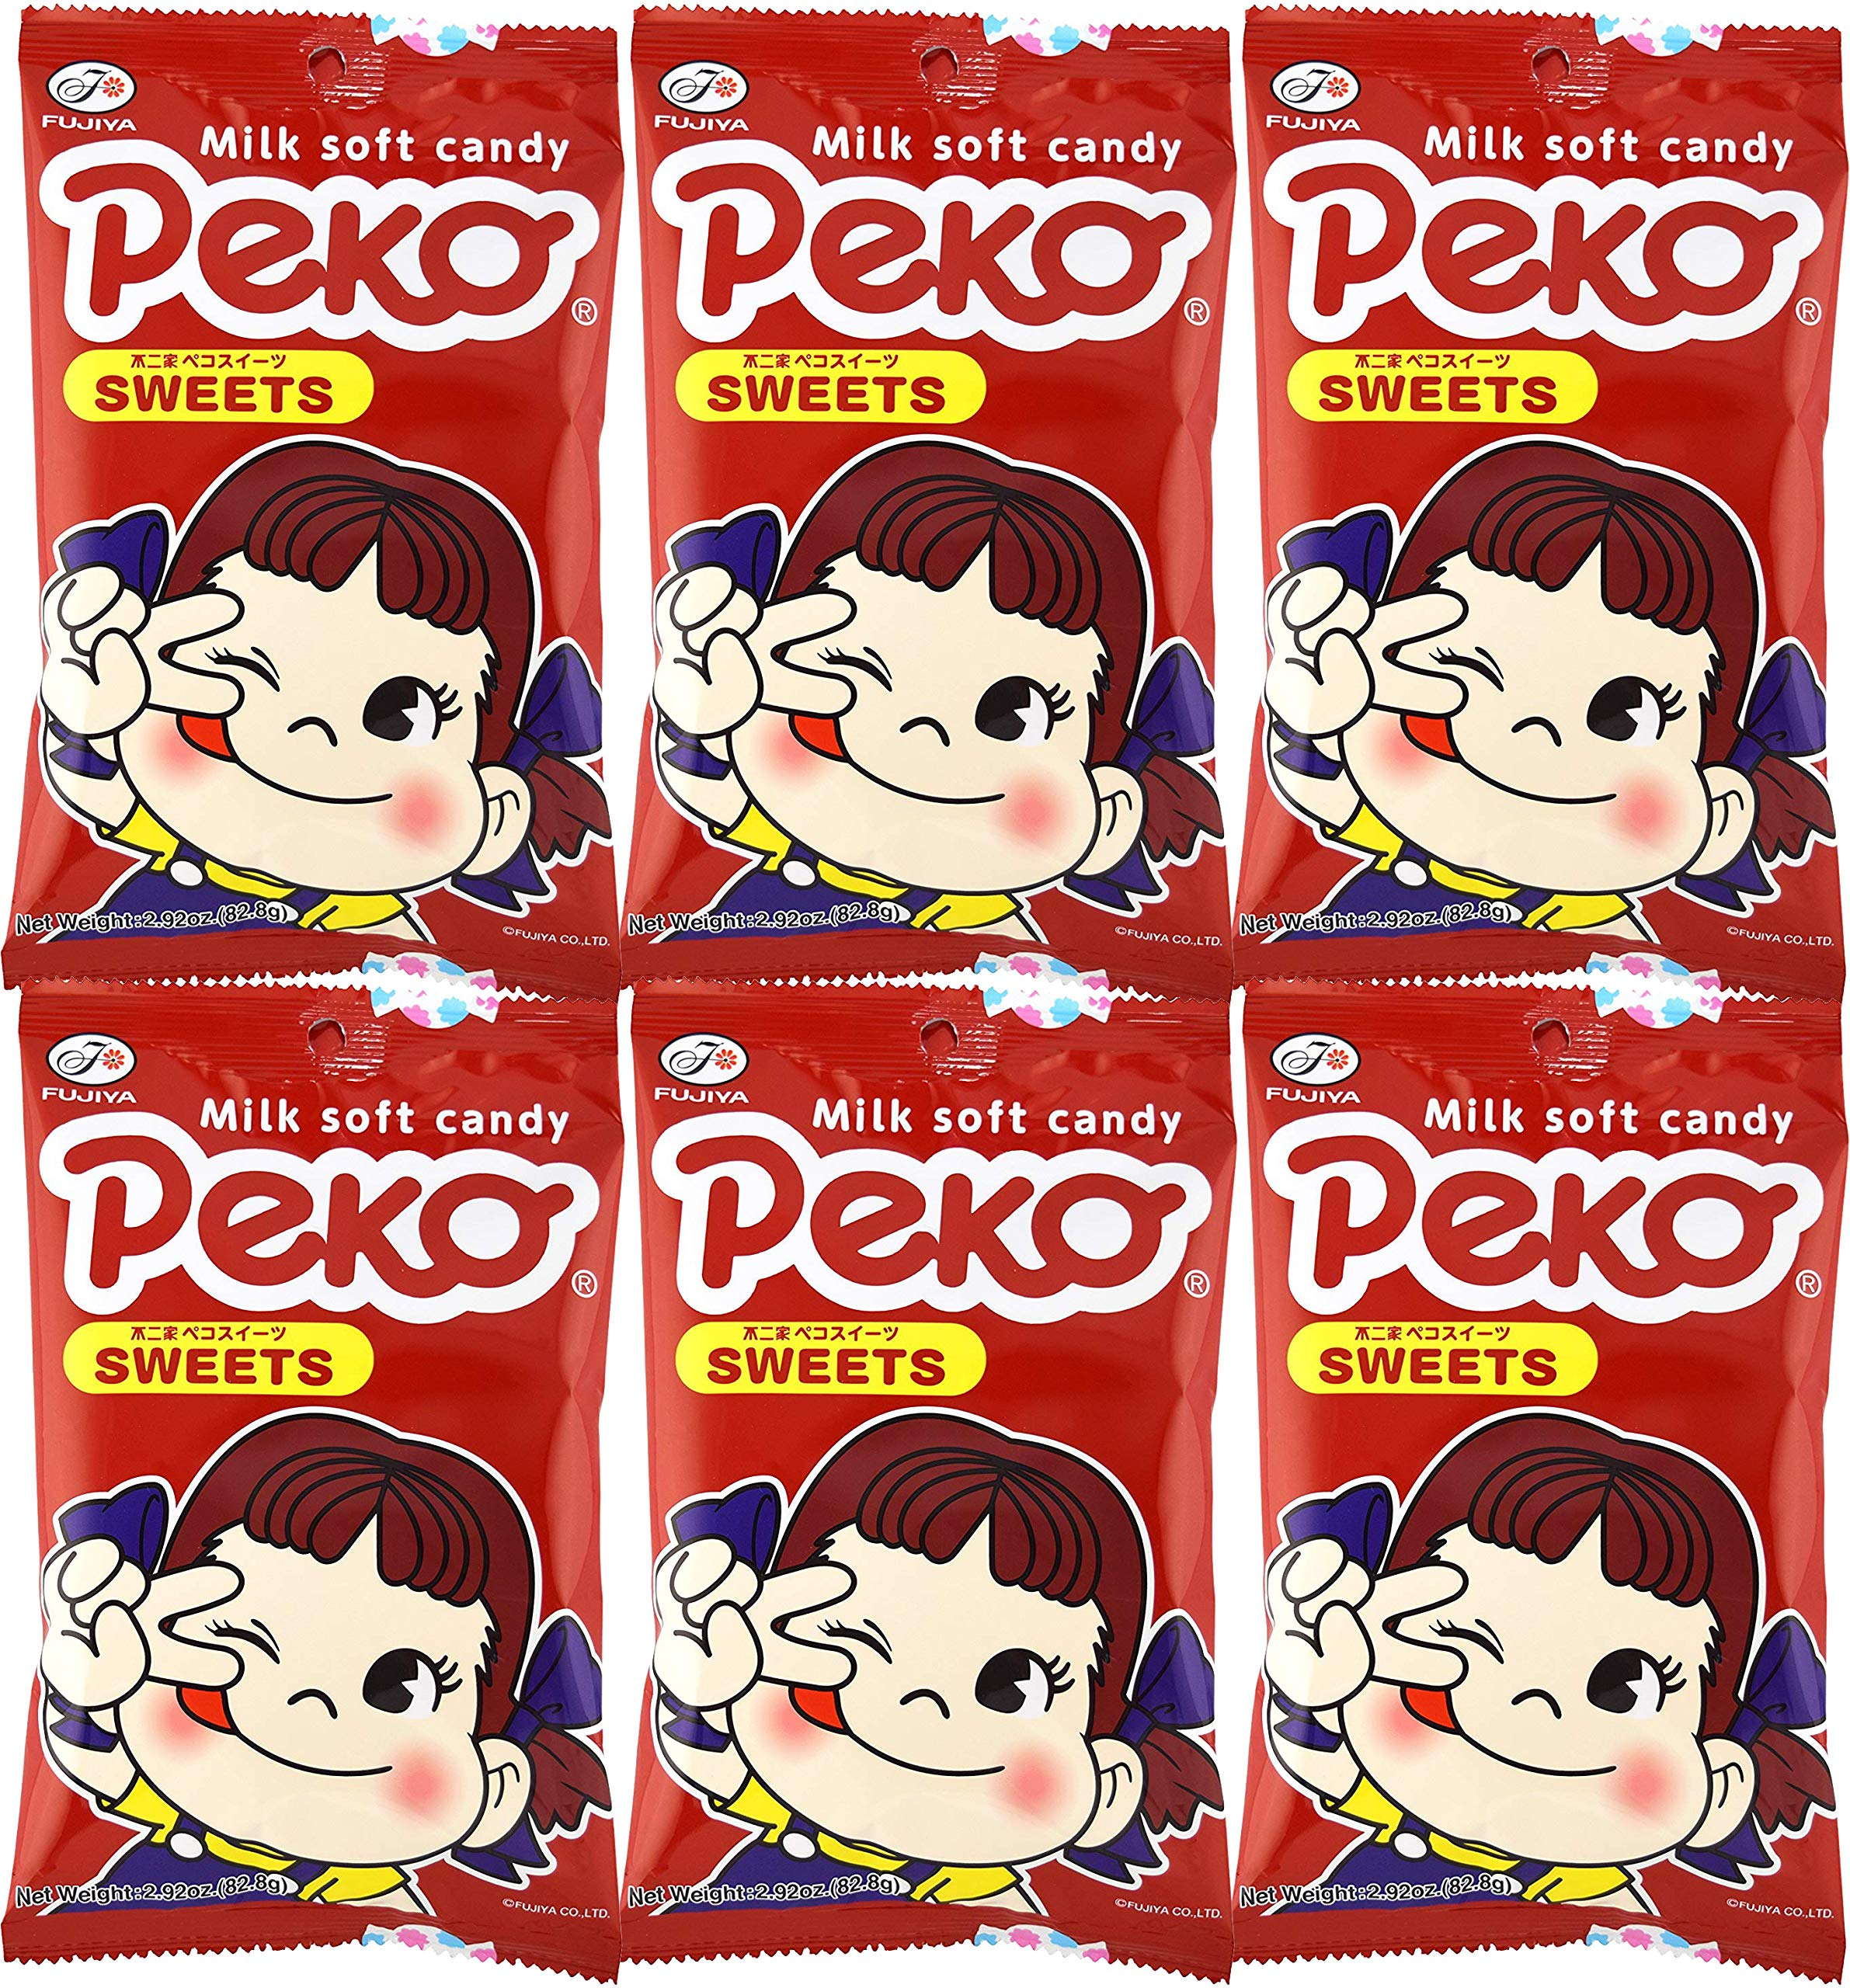 Fujiya Peko Sweets 2.92oz (6 Pack) by Fujiya